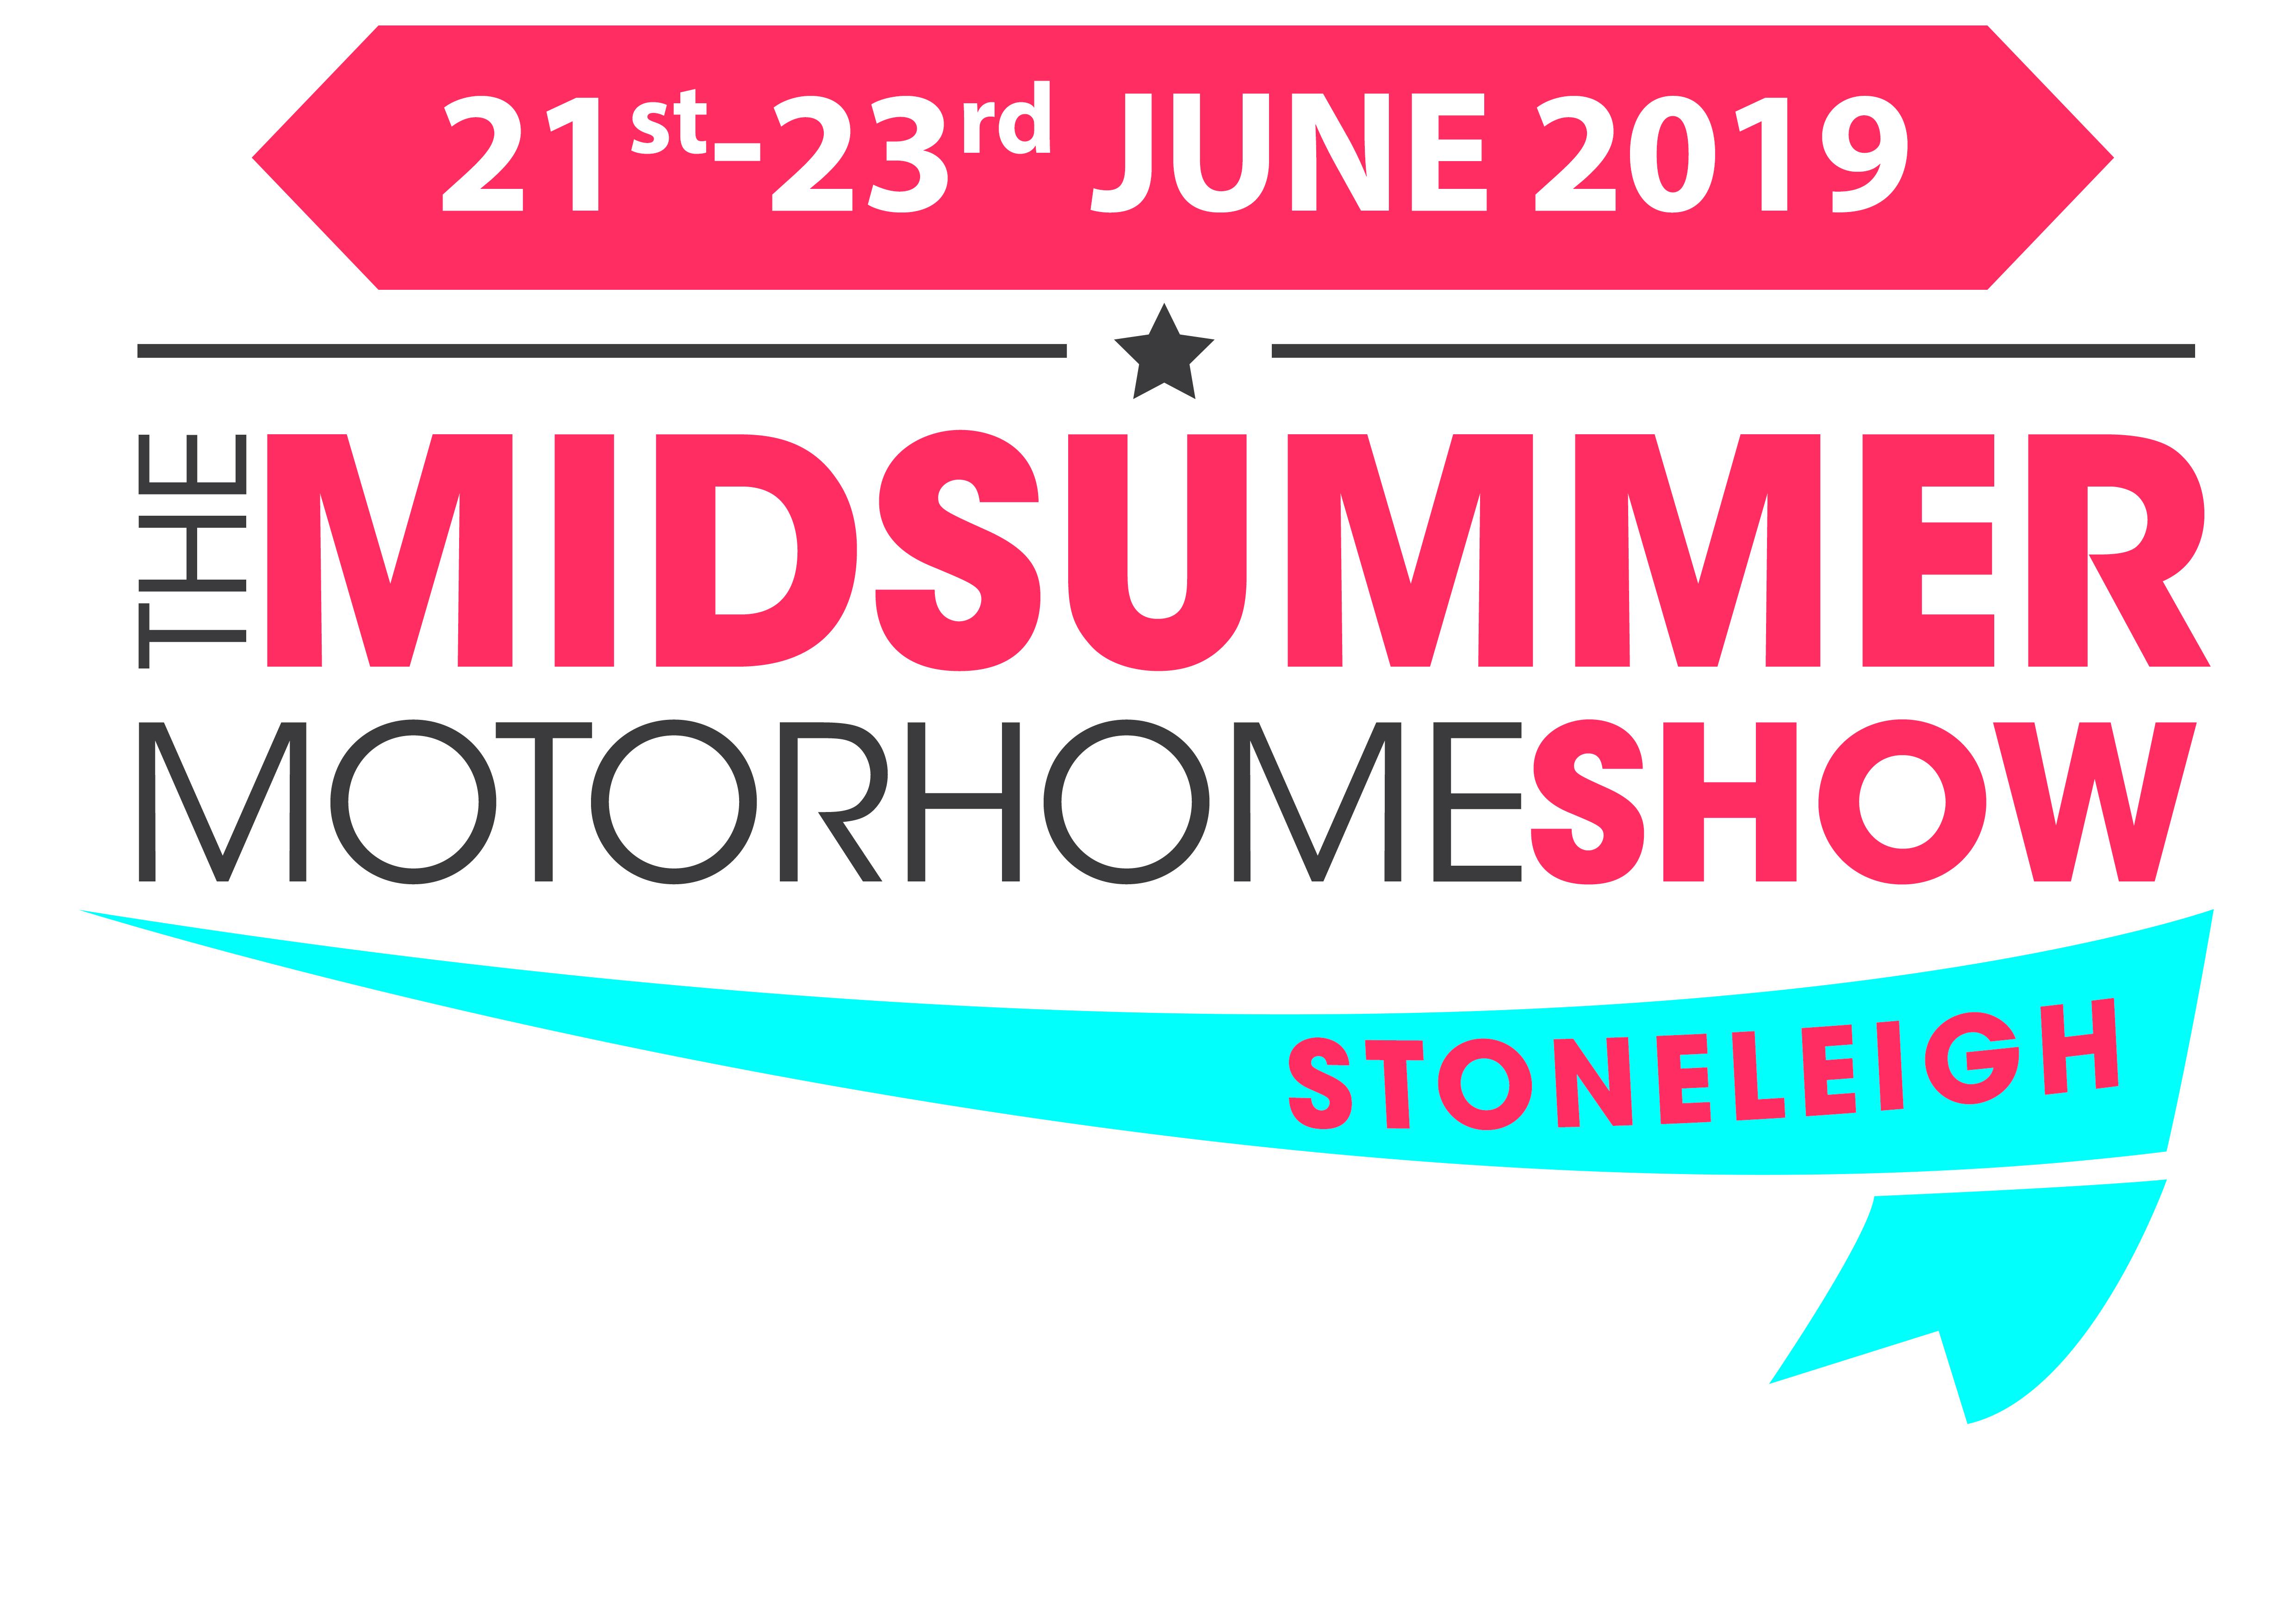 The Midsummer Motorhome Show – 21st – 23rd June 2019 - Warners Group